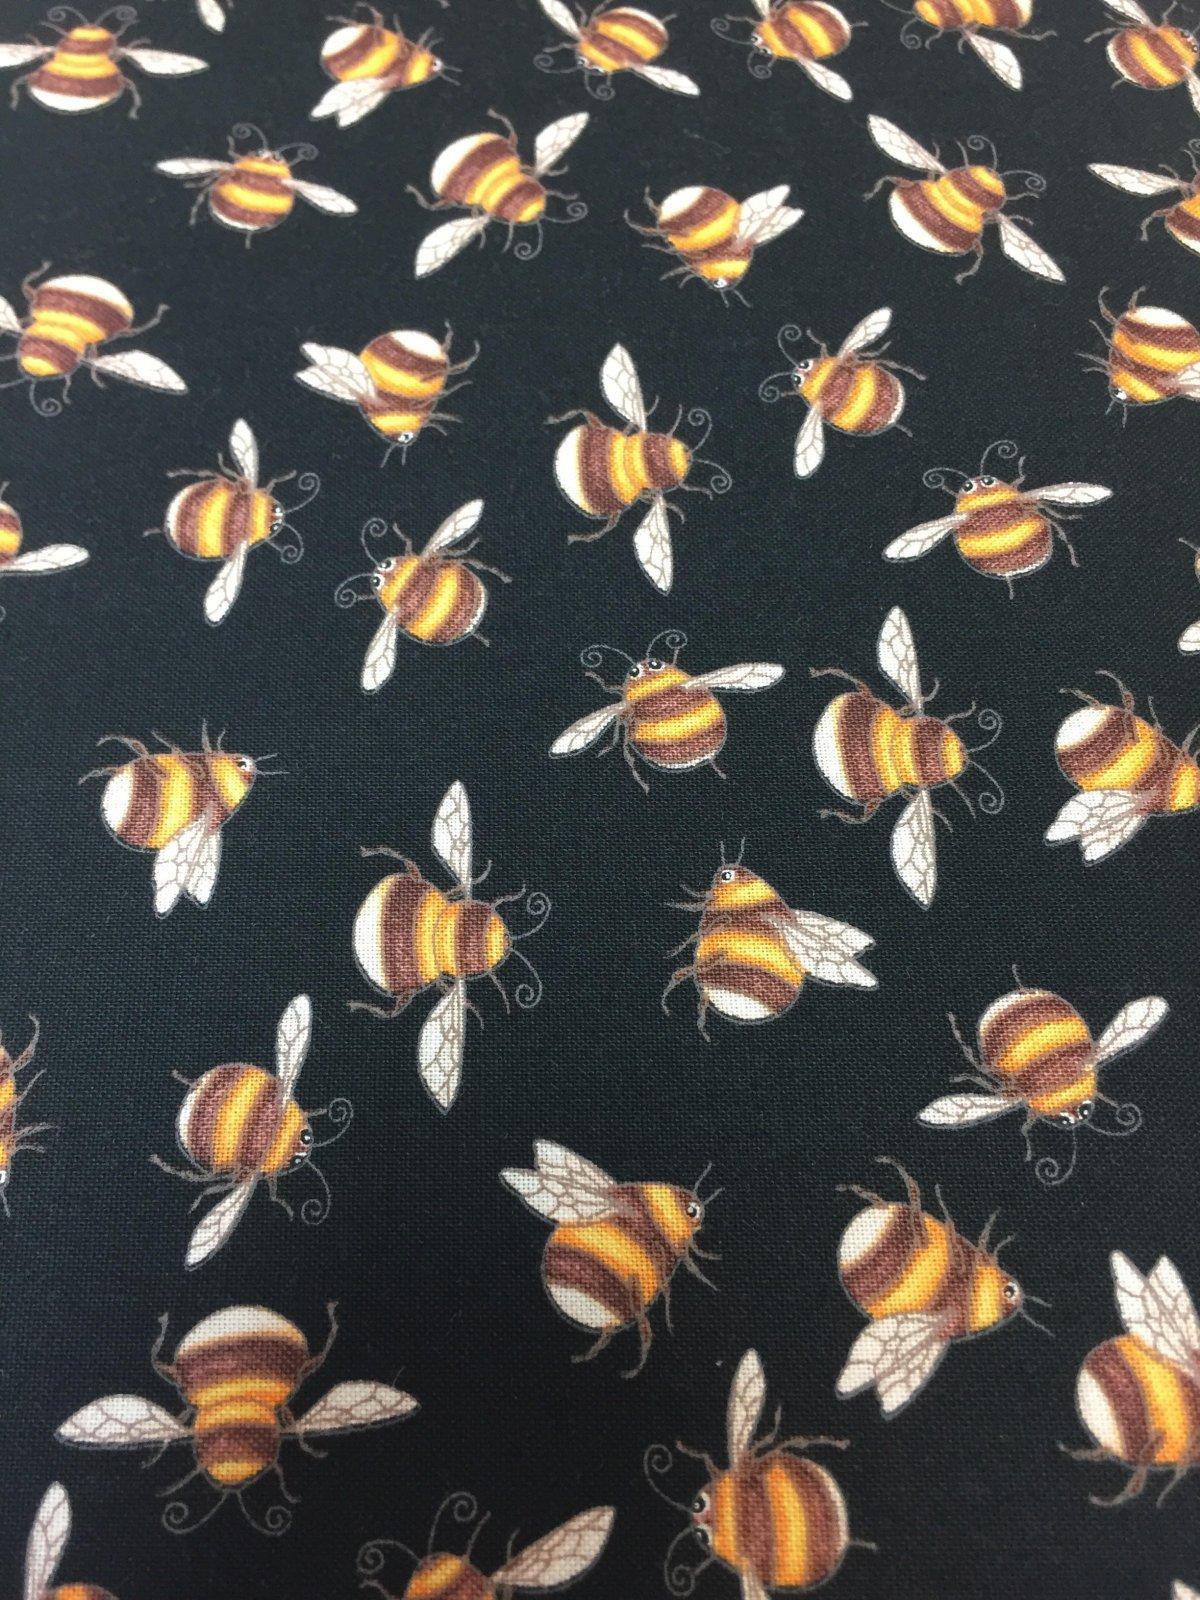 RJR Fabrics Woodland Tails by Dan Morris